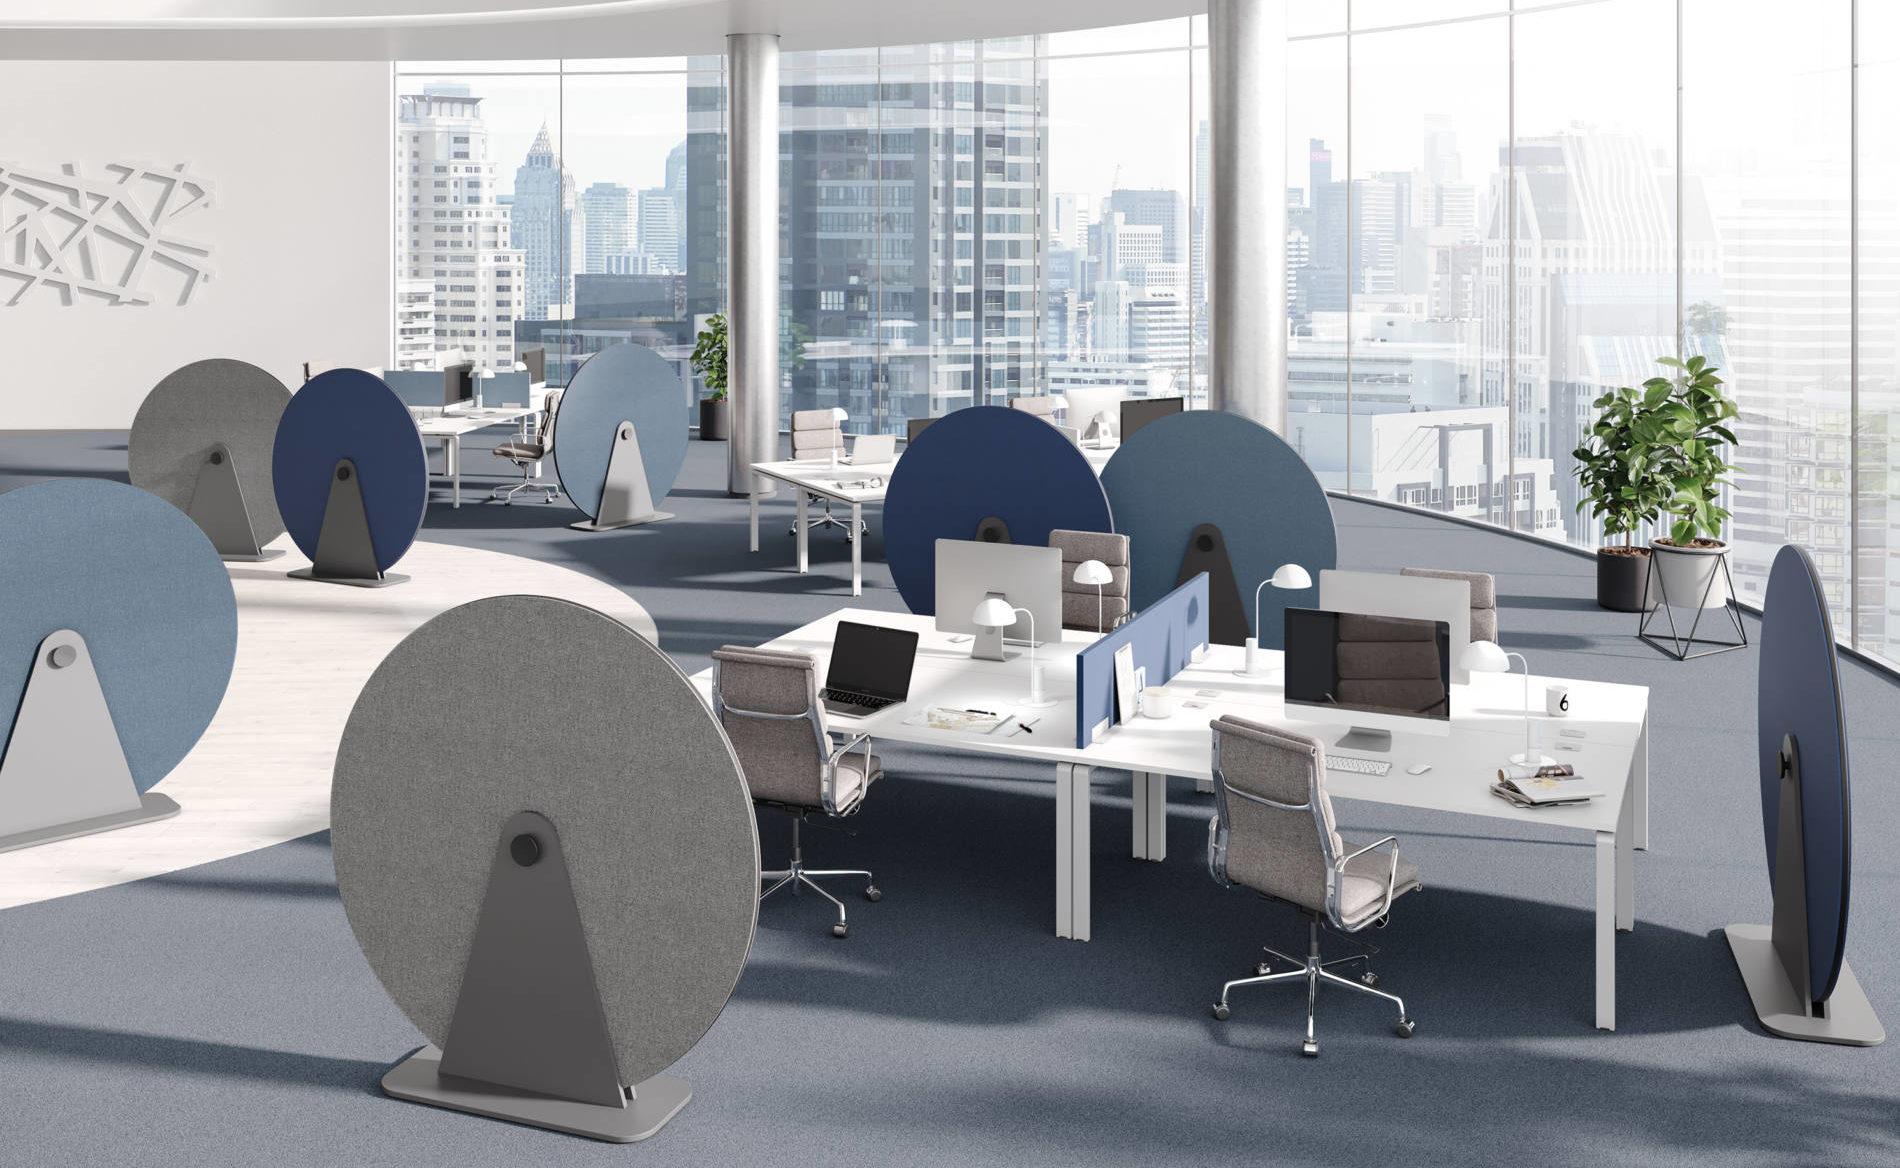 Mobiler, runder Absorber DISC im Großraumbüro (Palmberg)